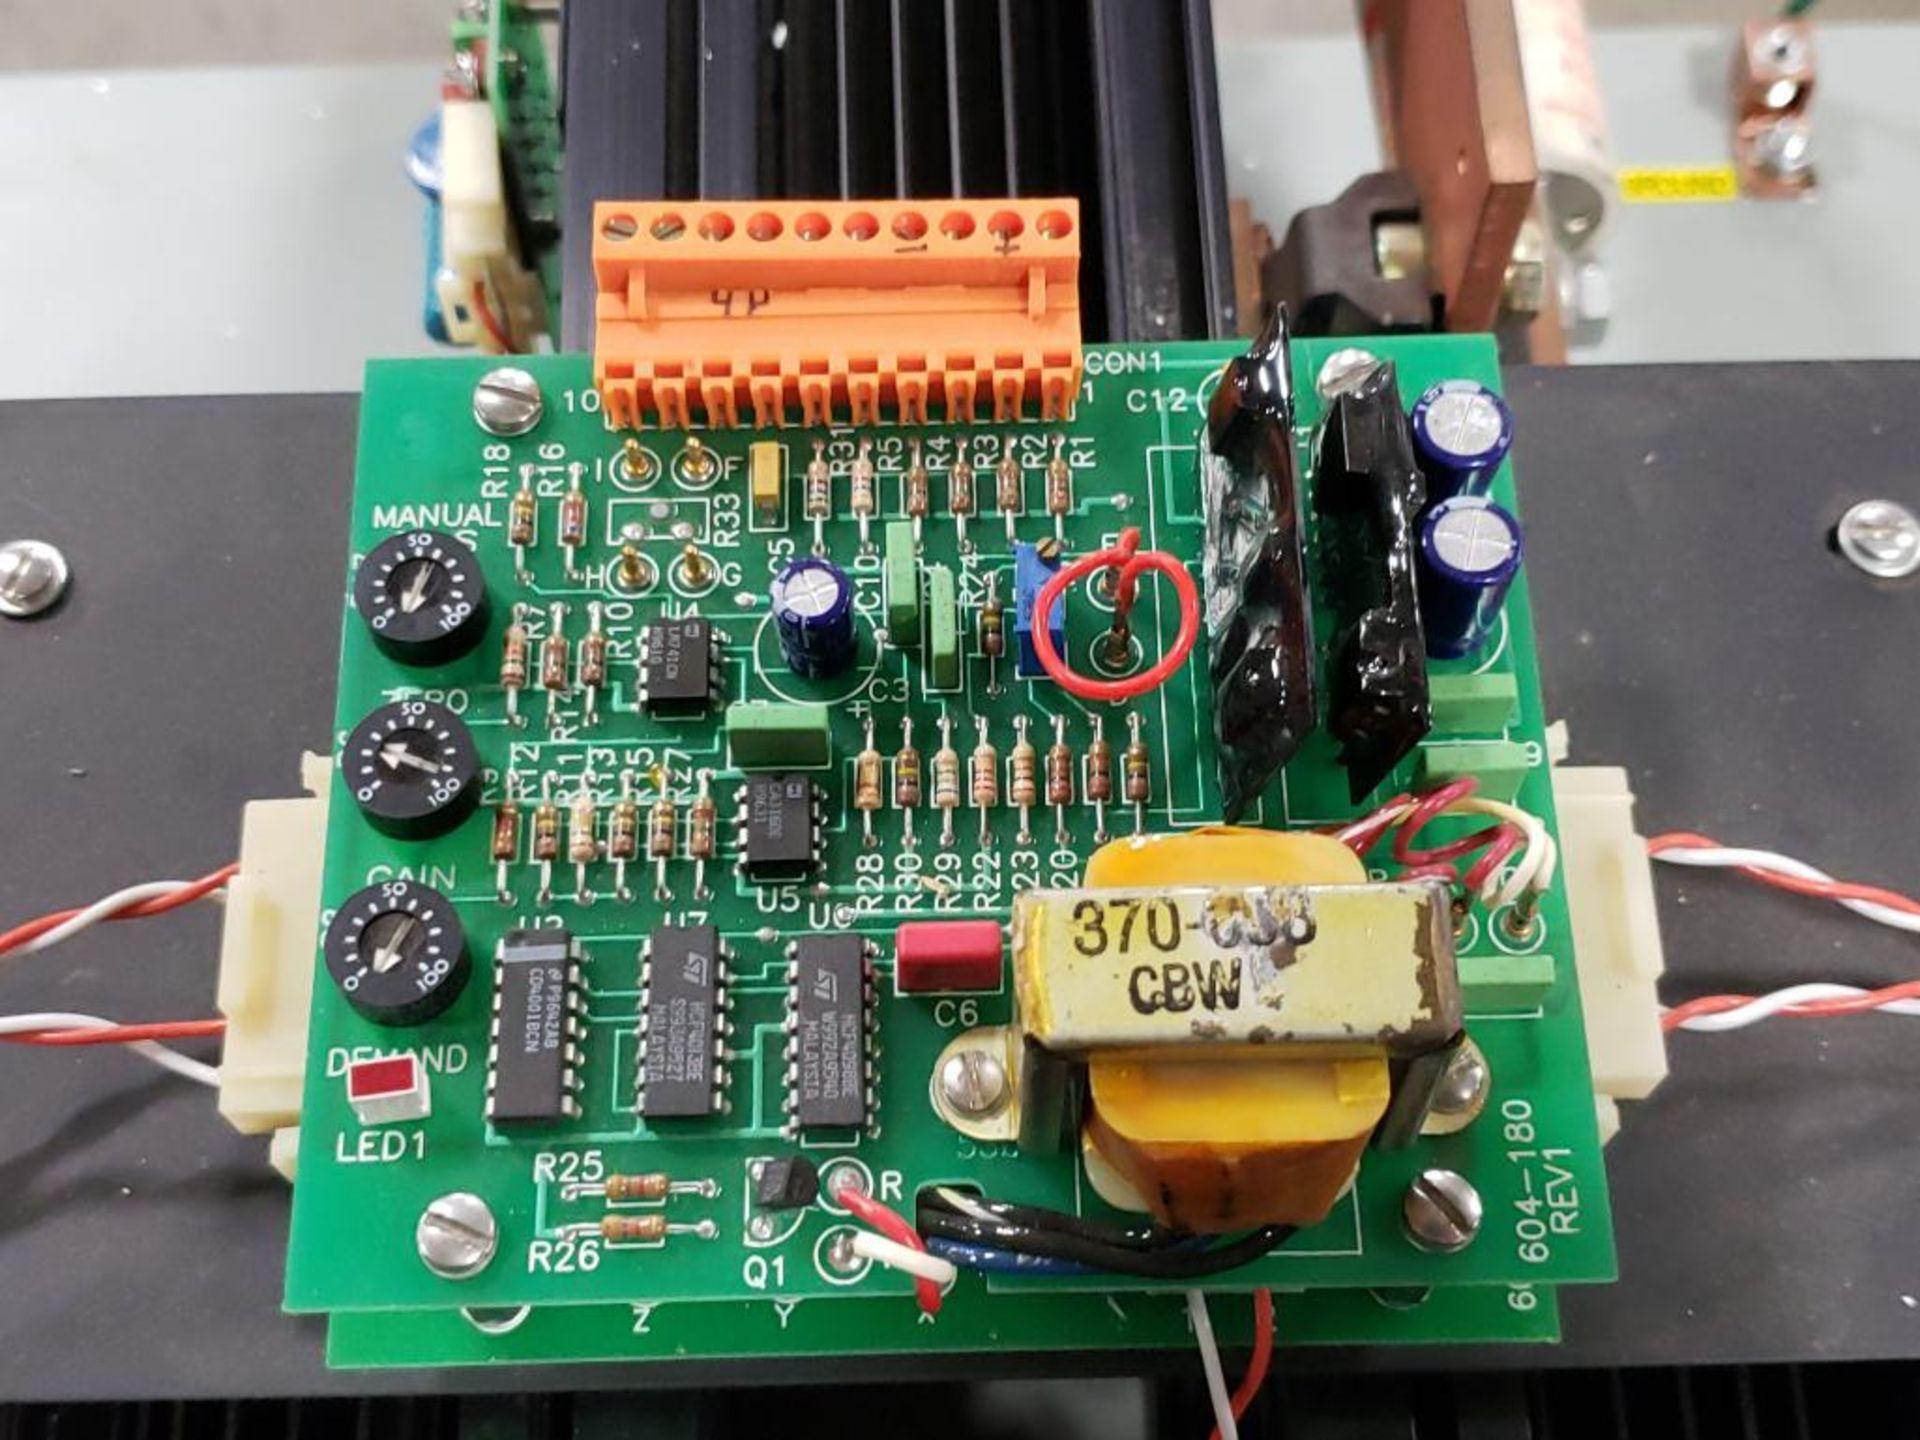 Chromalox 7830-309520-0400 power pak controller. - Image 5 of 10